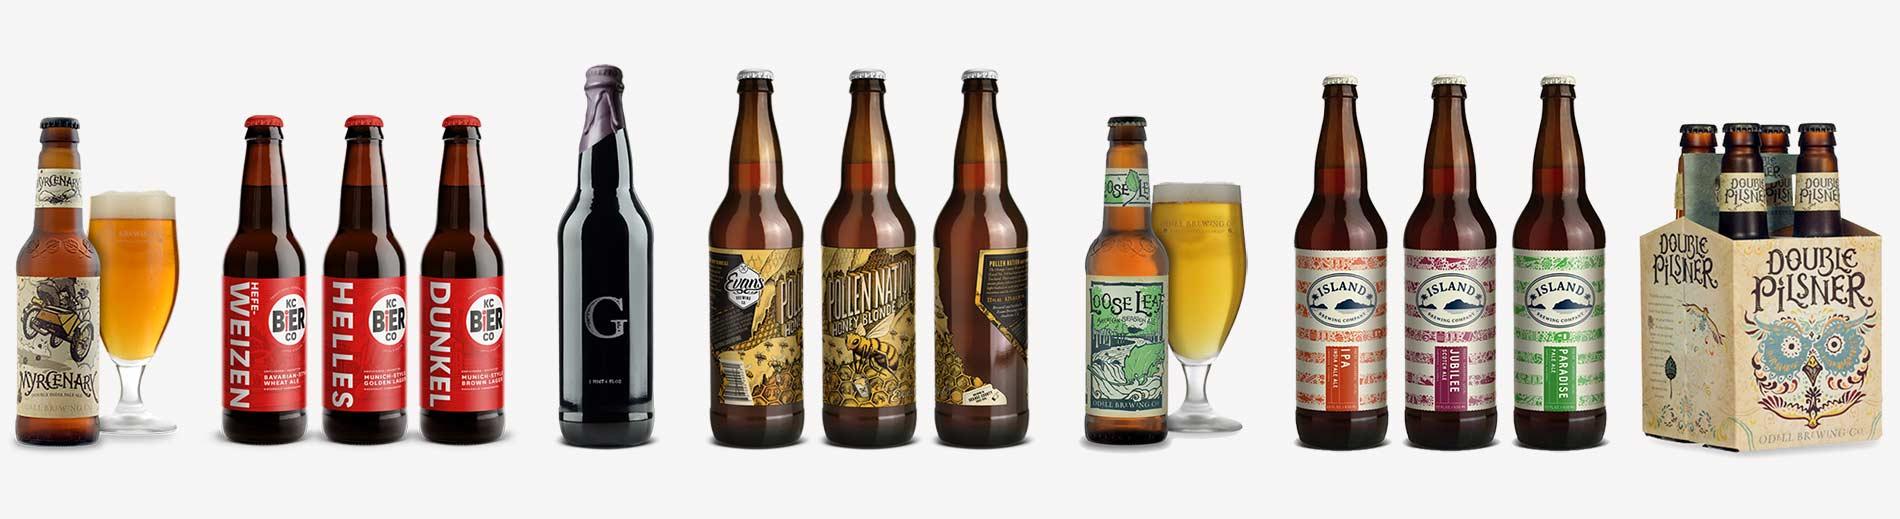 Craft Beer Label Design. ©Danno The Manno, Inc, ©TBD Agency